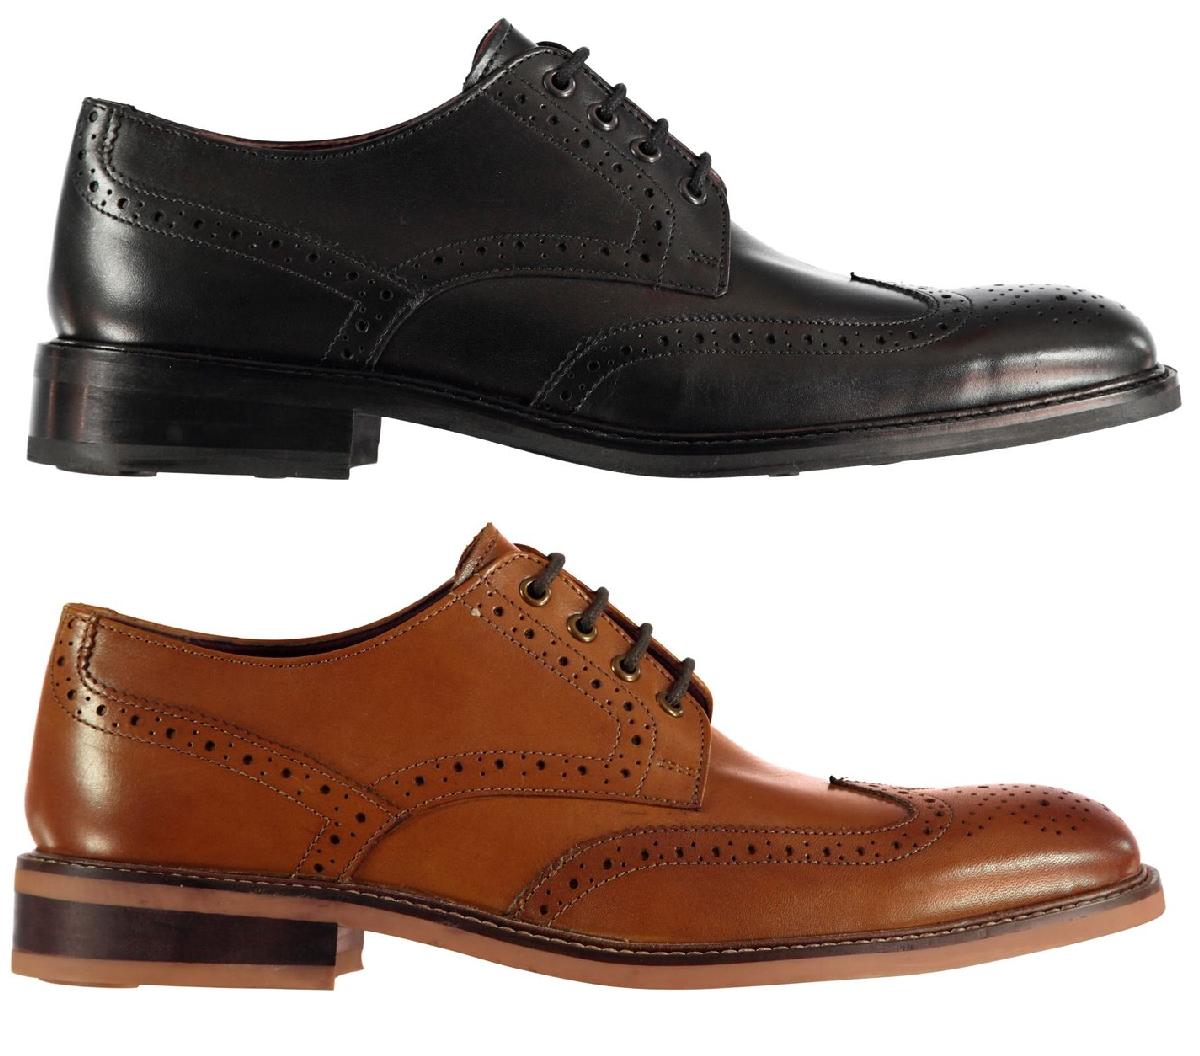 Firetrap chaussures Basses hommes Business chaussures Chaussure Lacée Rutland Low 2204